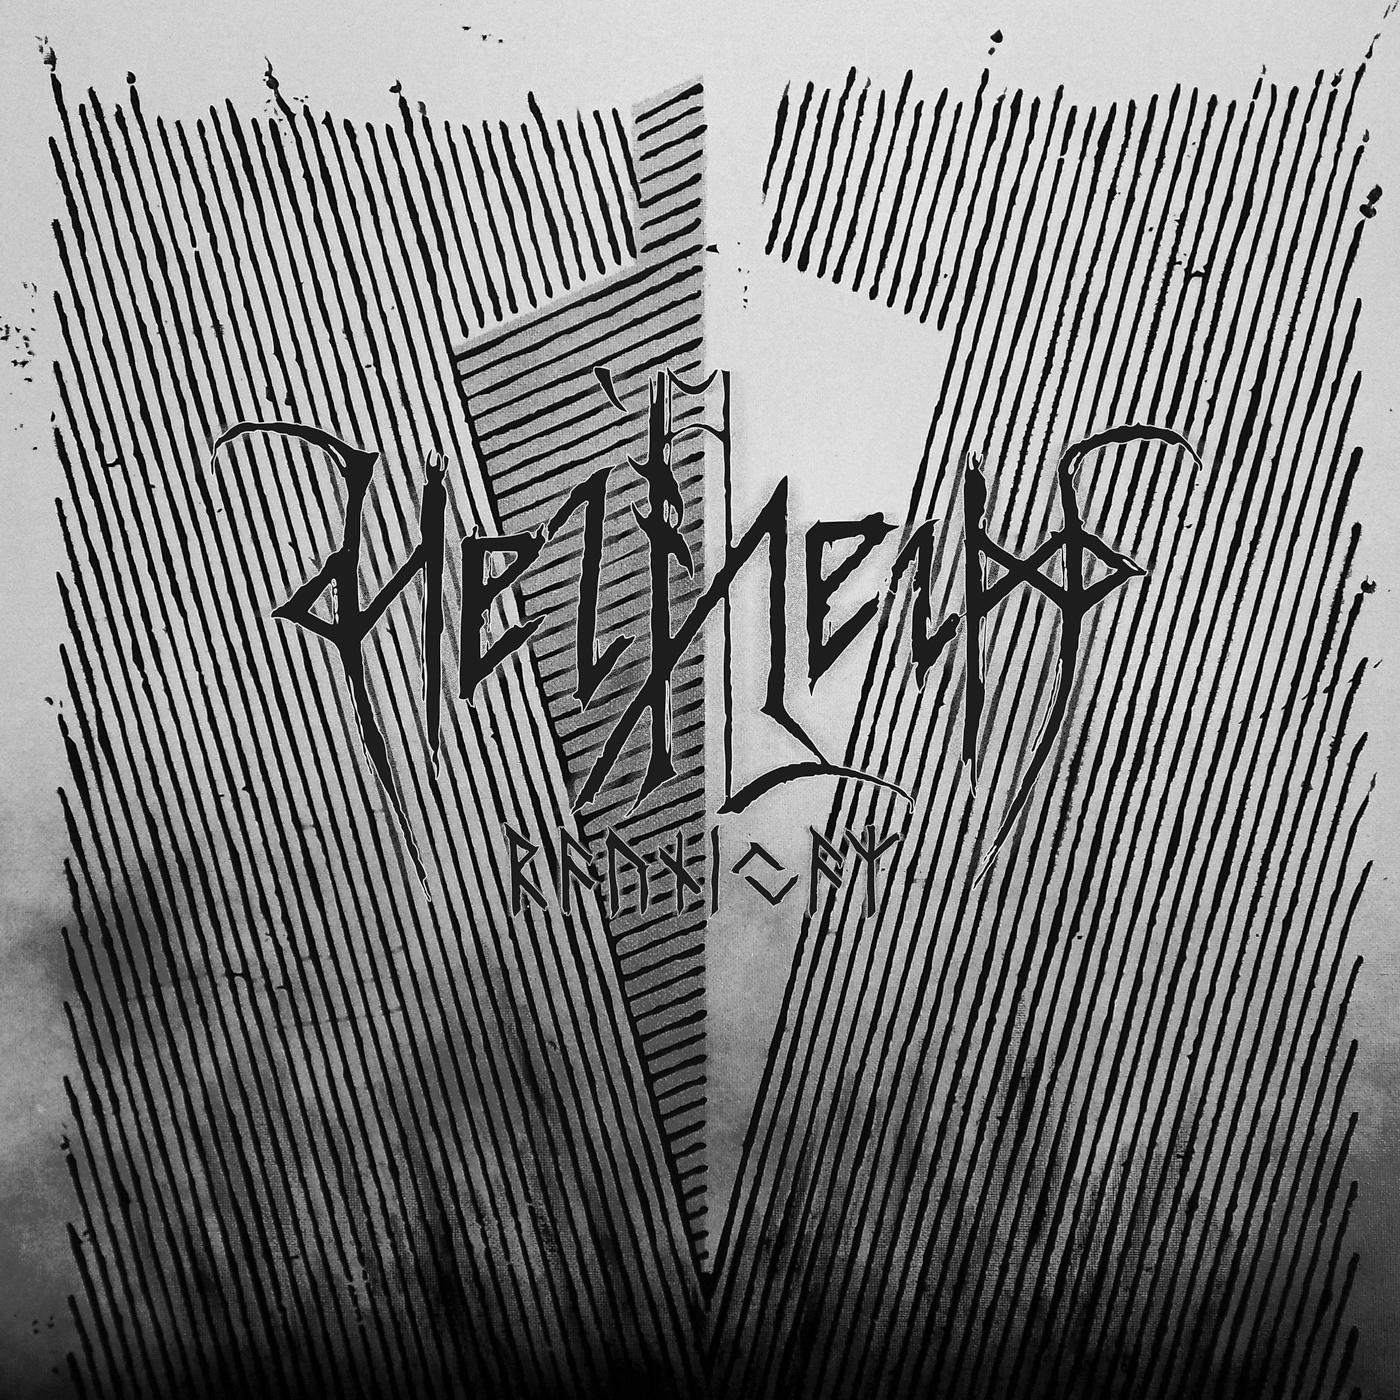 Helheim Raunijar 01